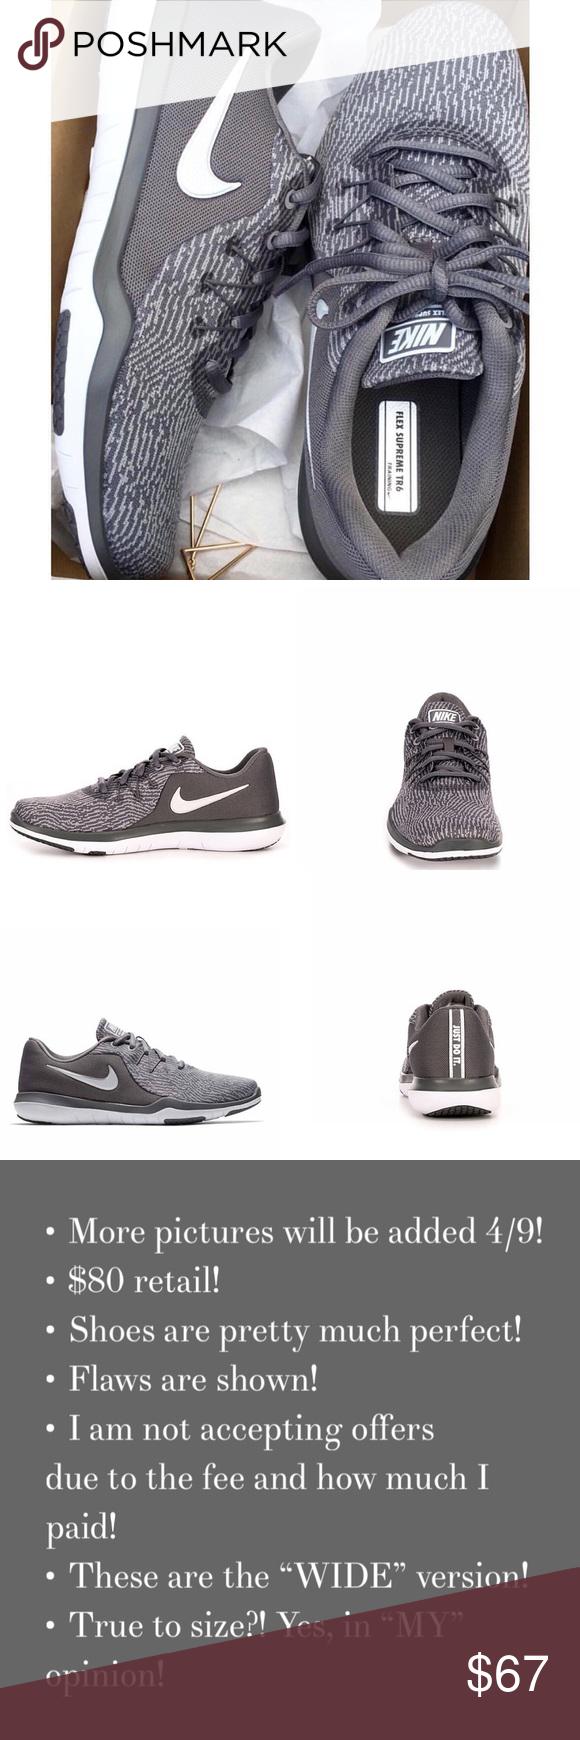 0176396168c Women s Nike Flex Supreme TR6 Training Shoes ♡ Worn 3 times! Like new!